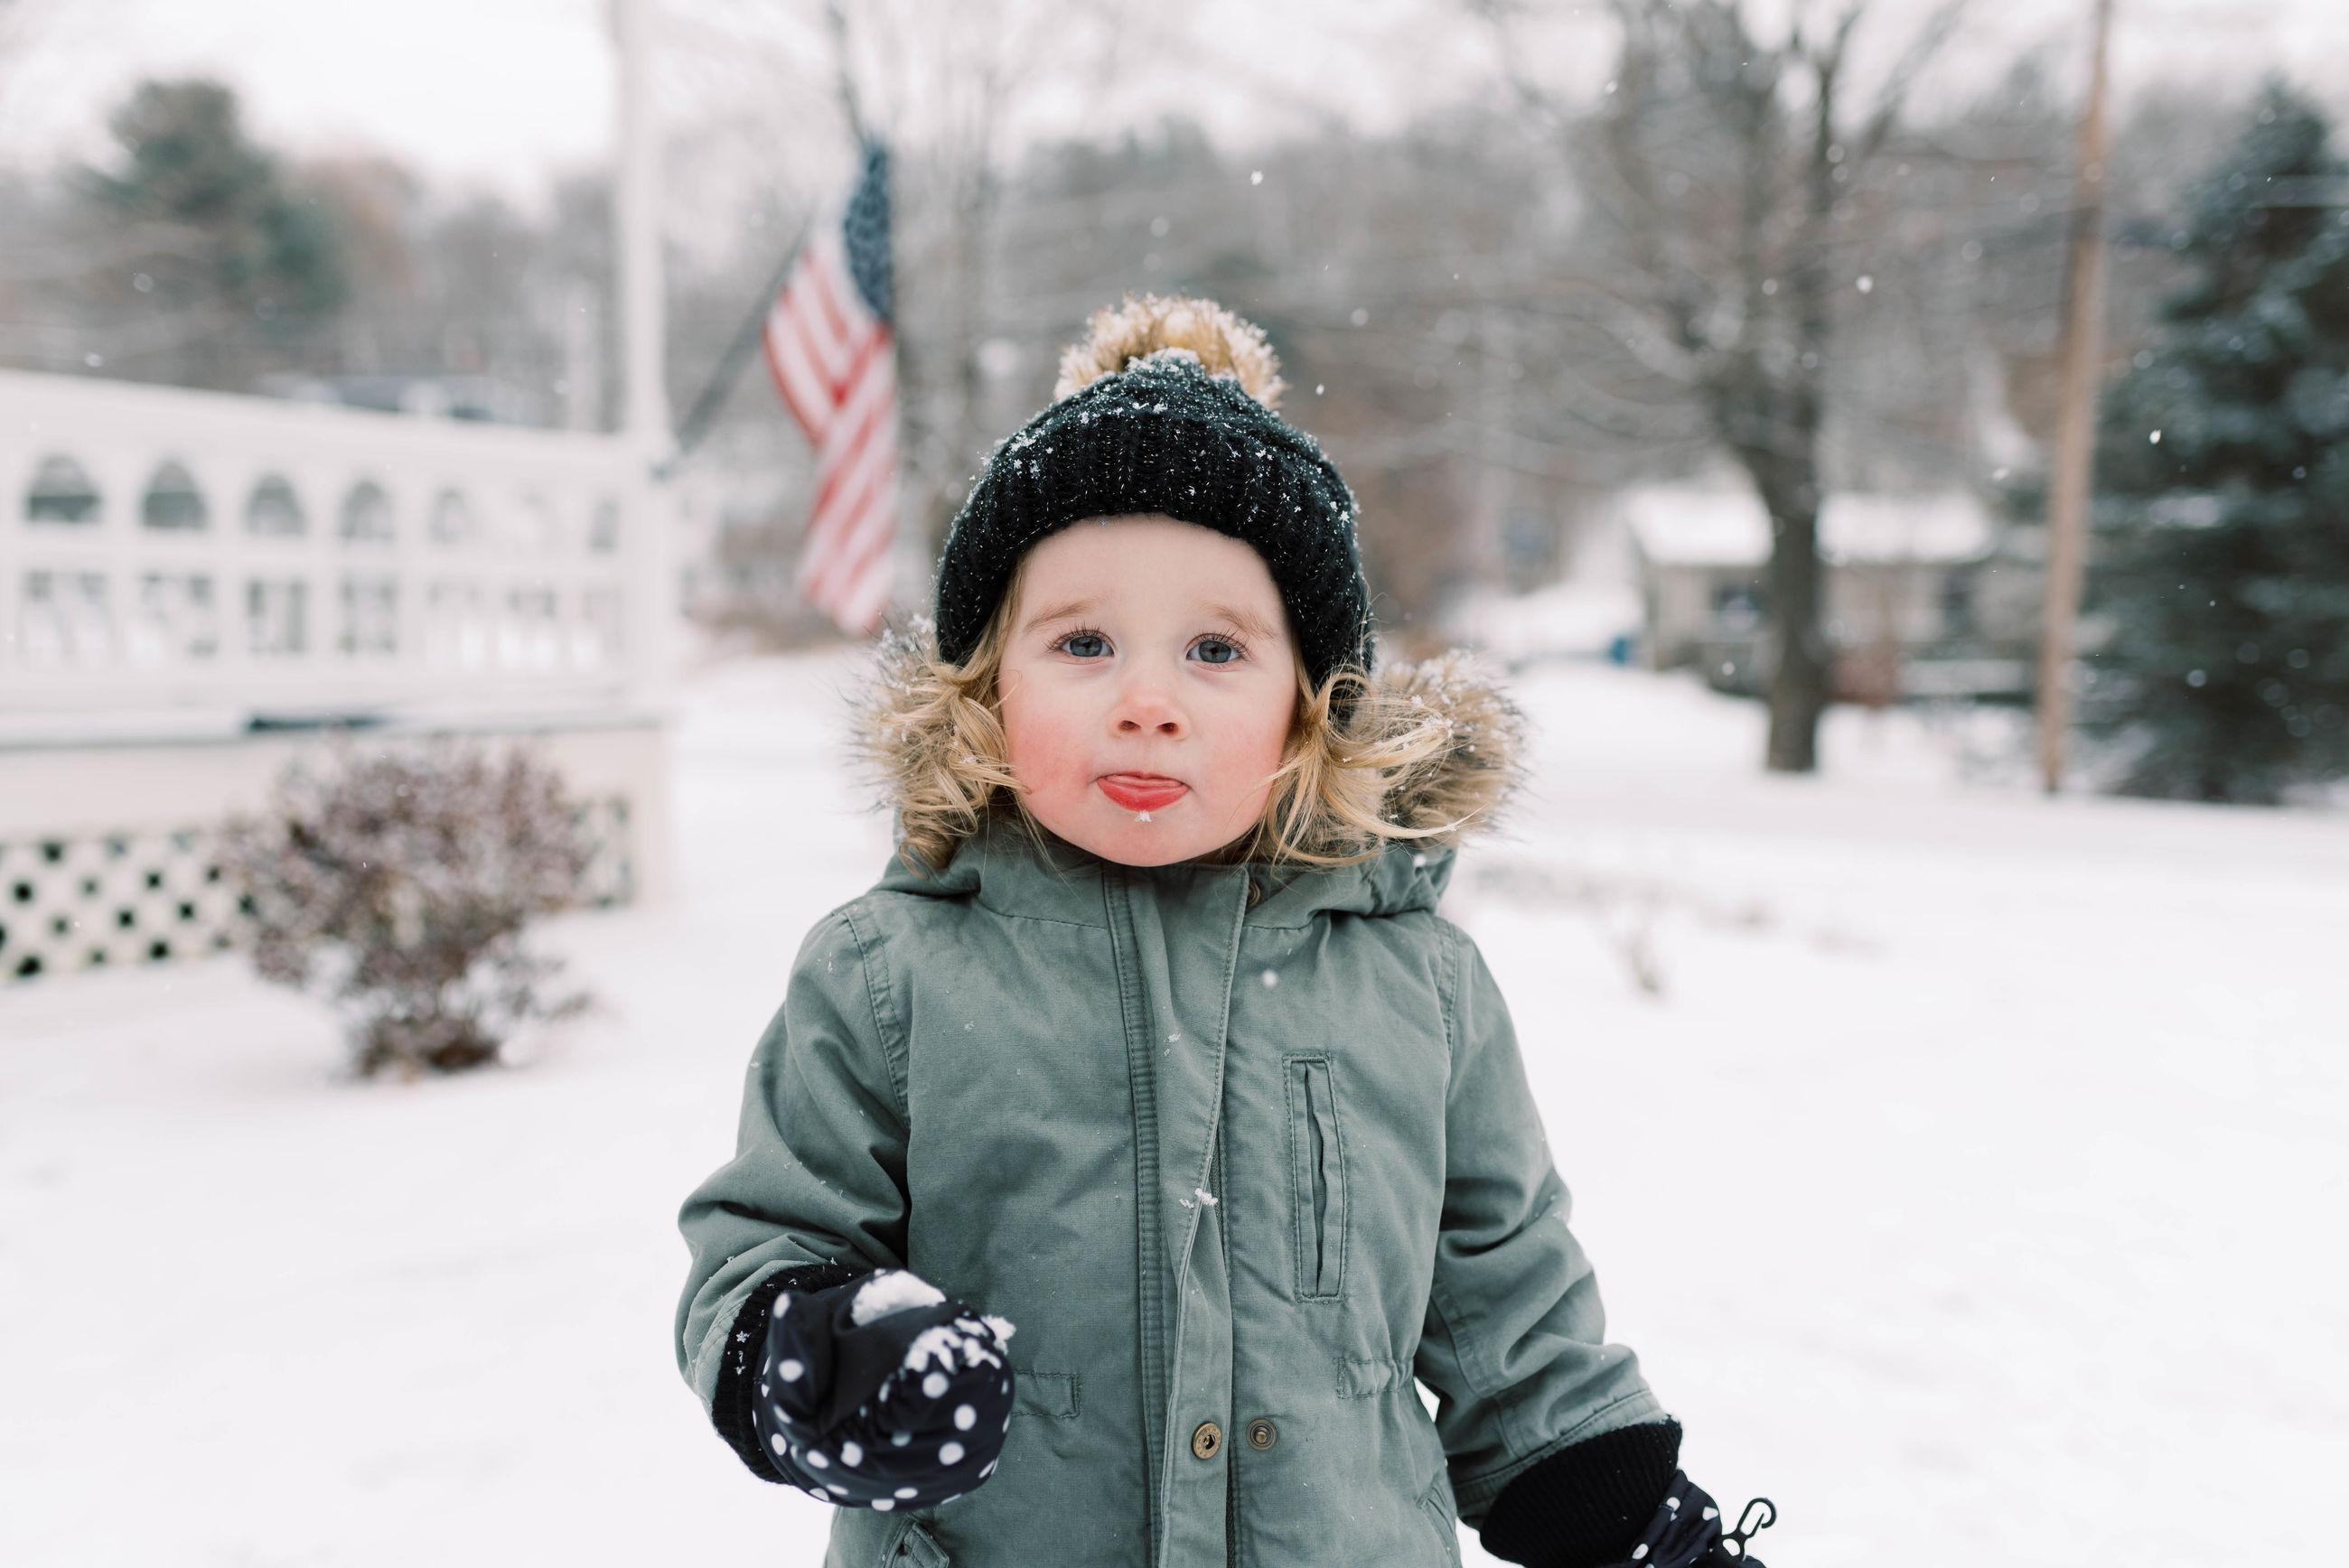 PORTRAIT OF CUTE BOY DURING WINTER